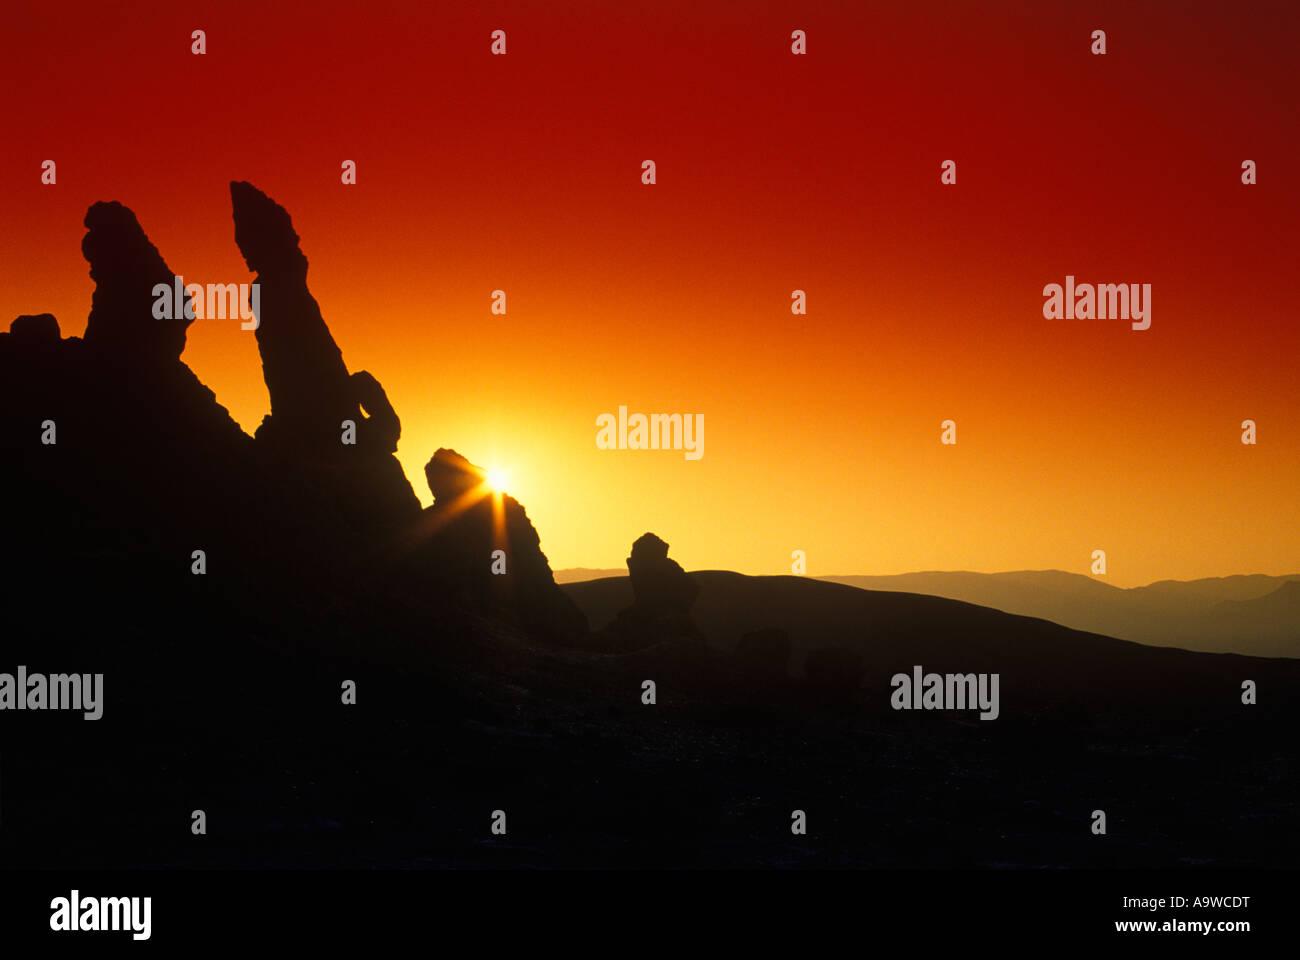 3 MARIAS ROCK FORMATION VALLE DE LA LUNA ATACAMA-WÜSTE SAN PEDRO DE ATACAMA II REGION IN CHILE Stockbild